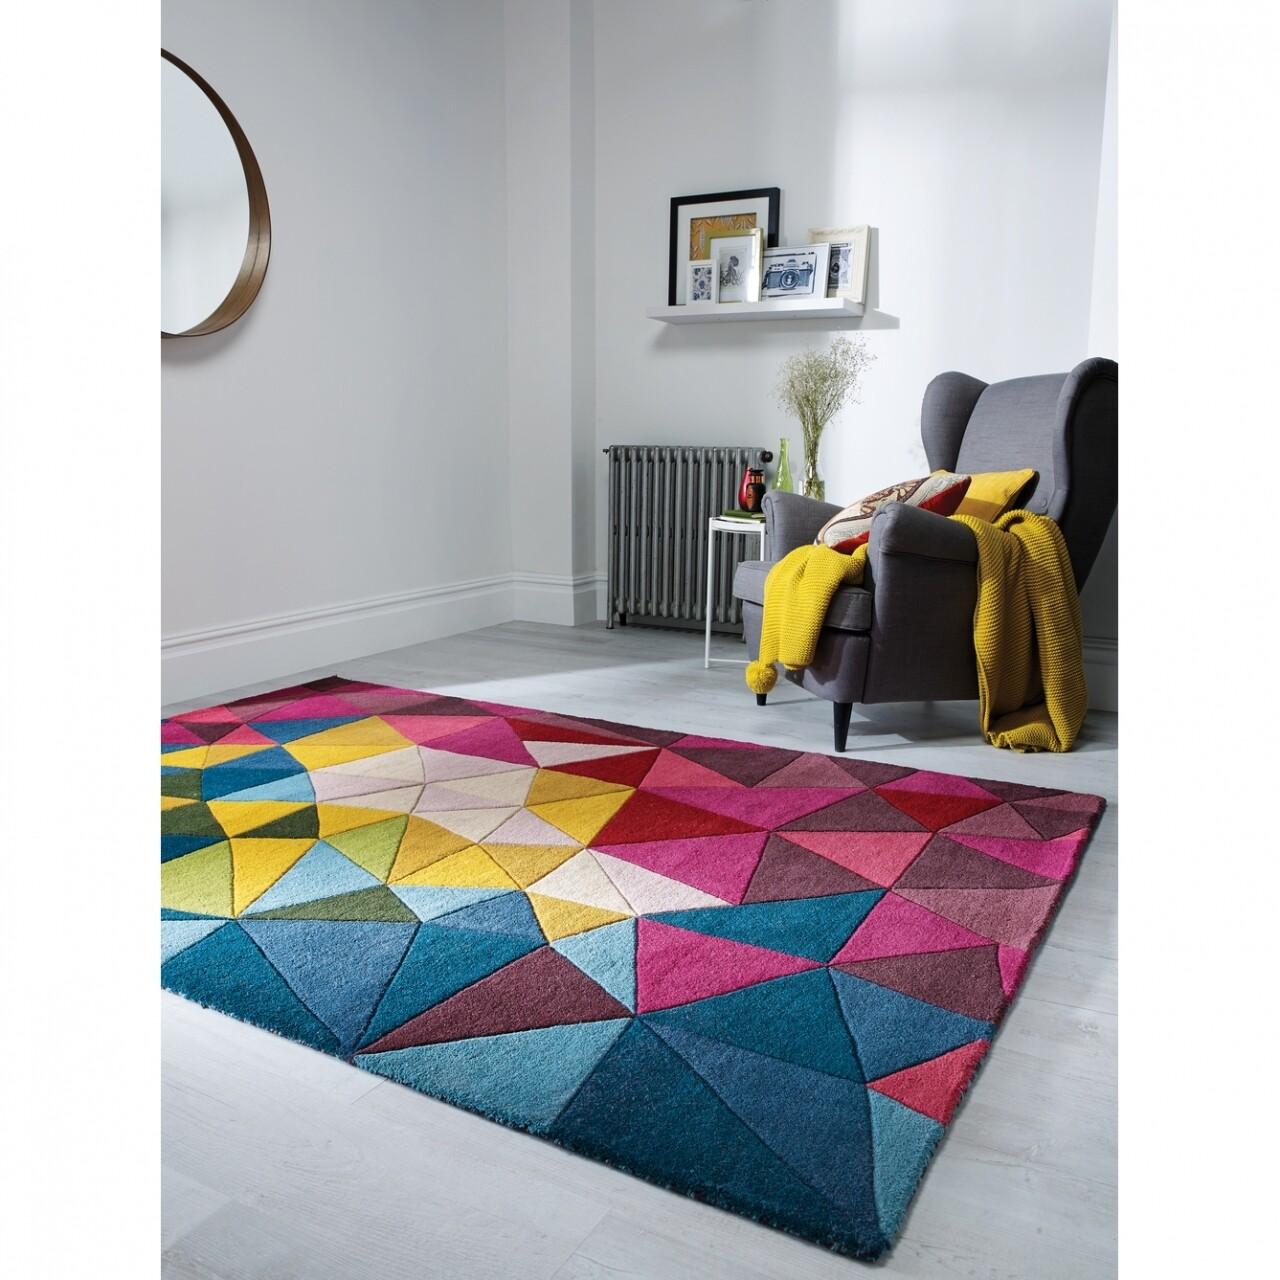 Covor Falmouth Multi, Flair Rugs, 120 x 170 cm, 100% lana, multicolor